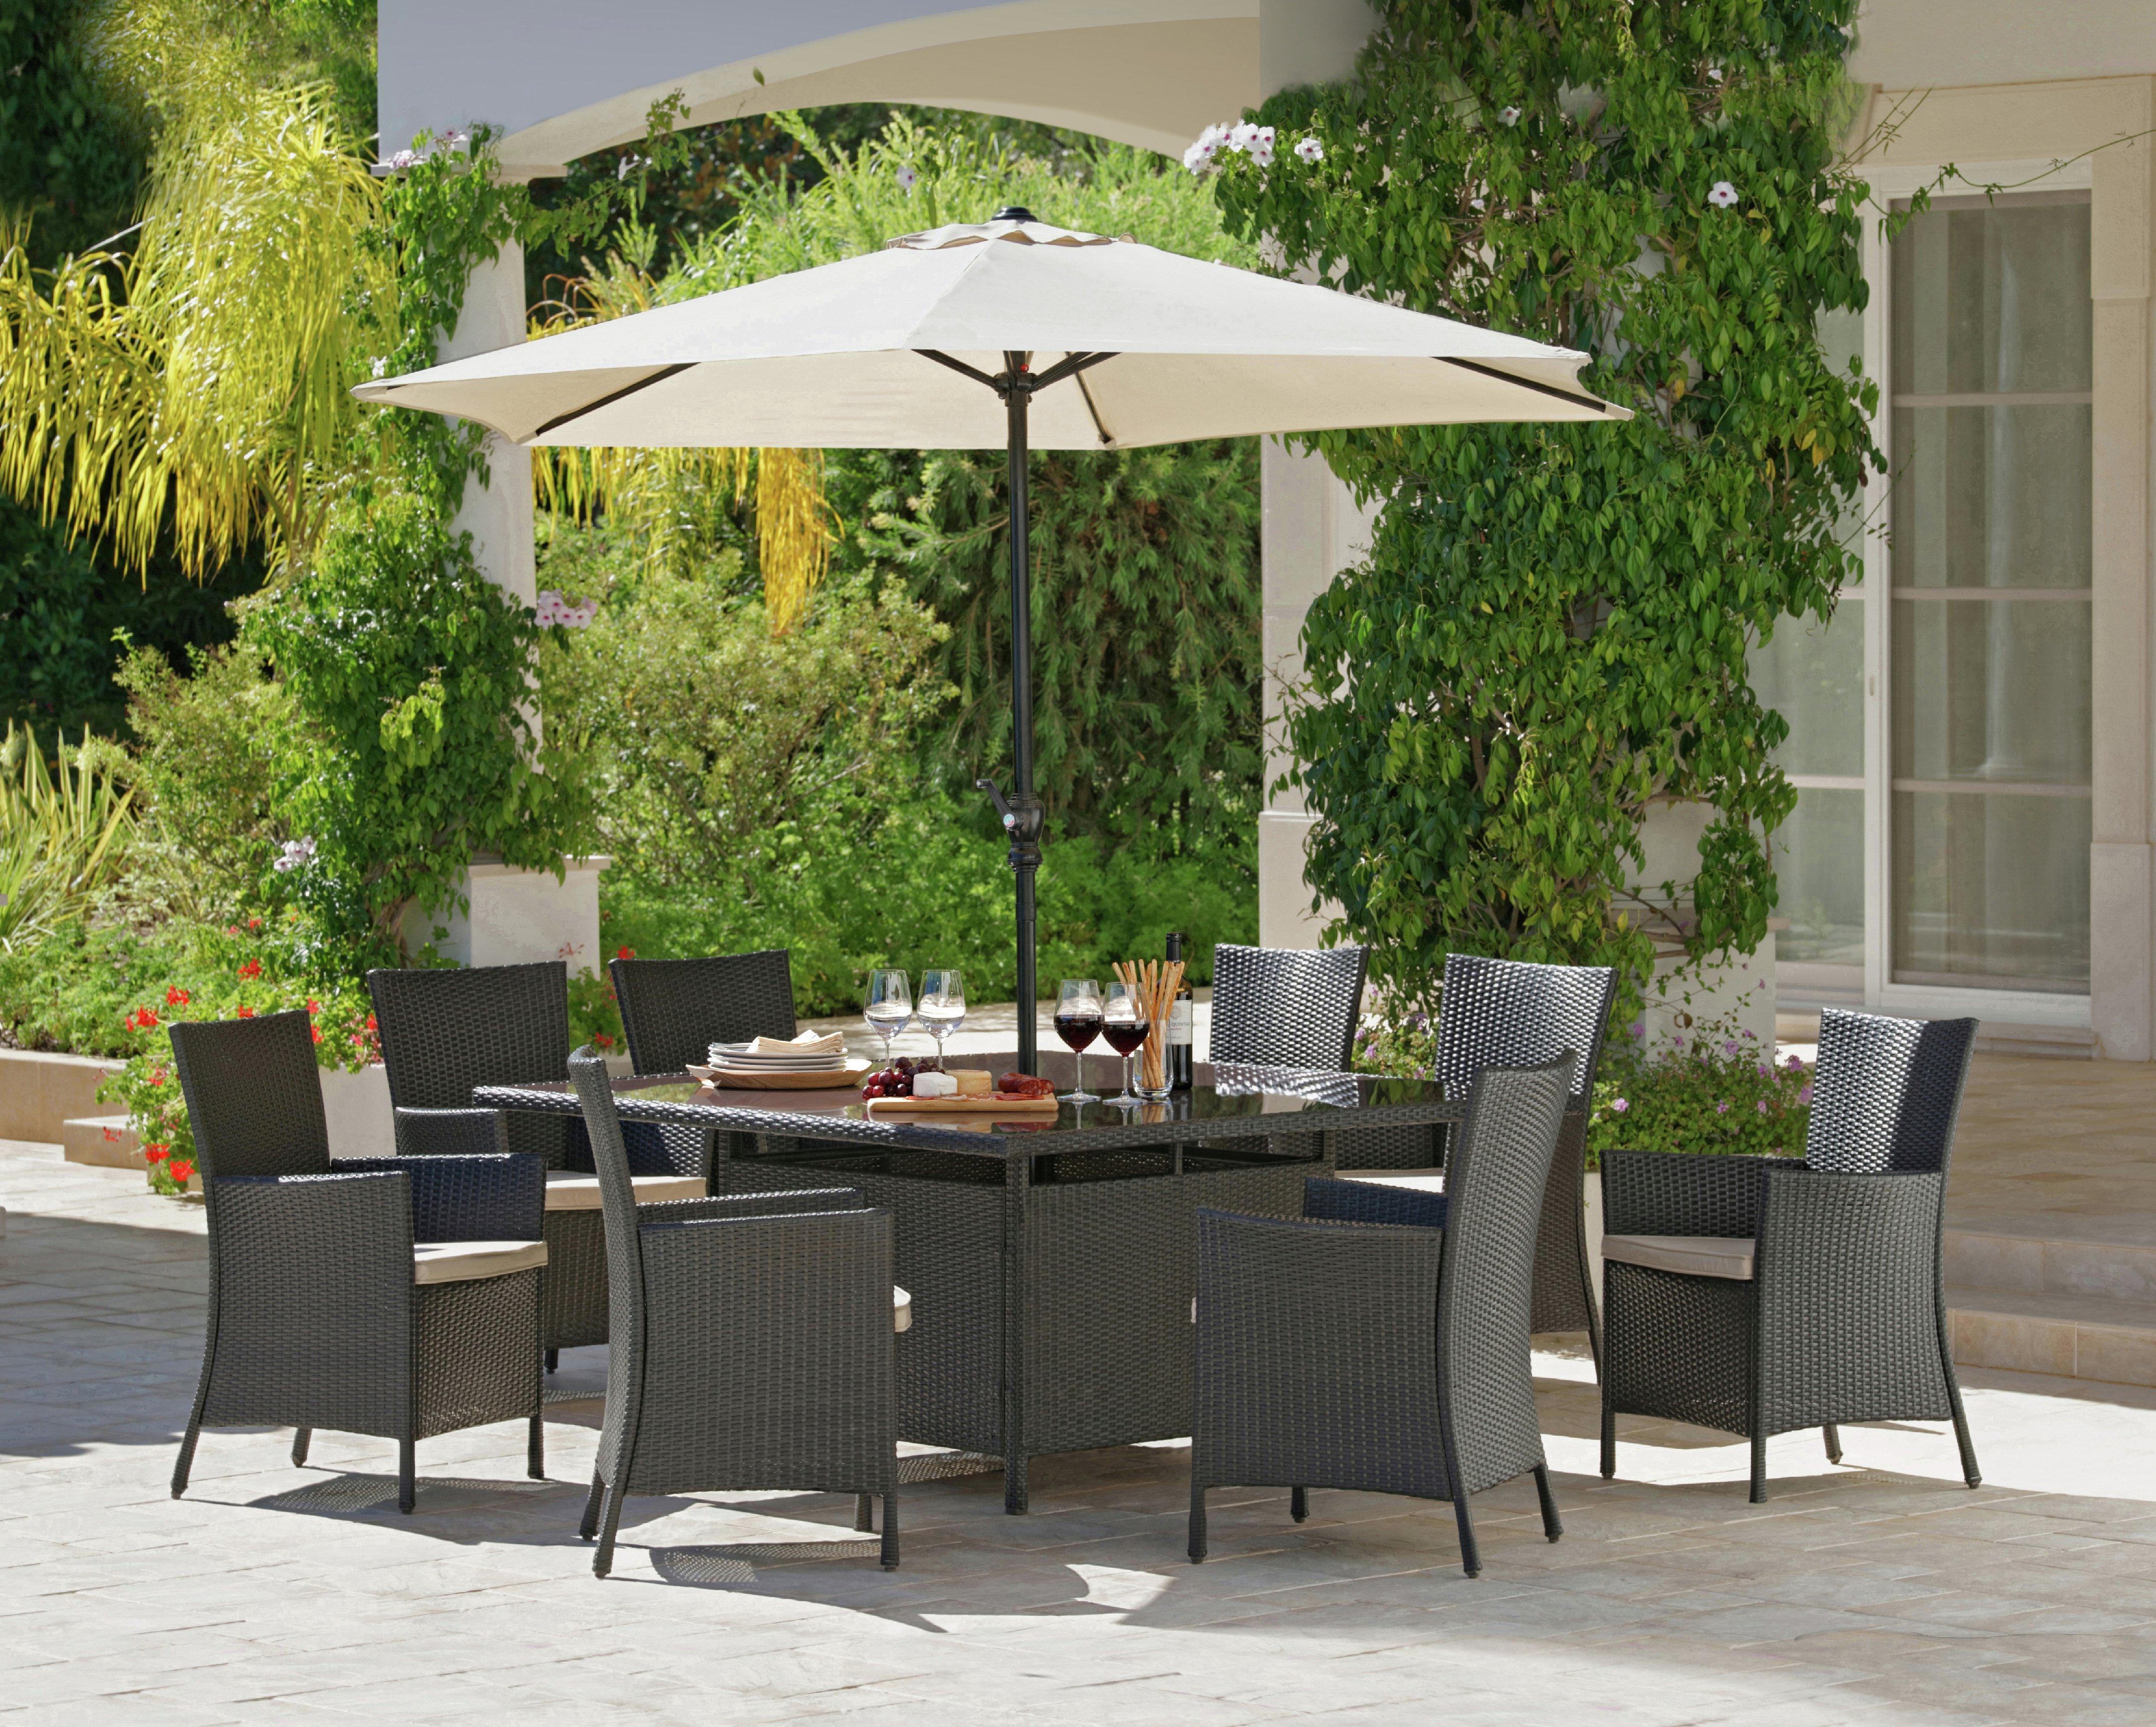 Garden Furniture 8 Seats buy bali rattan effect 8 seater patio furniture set - brown at